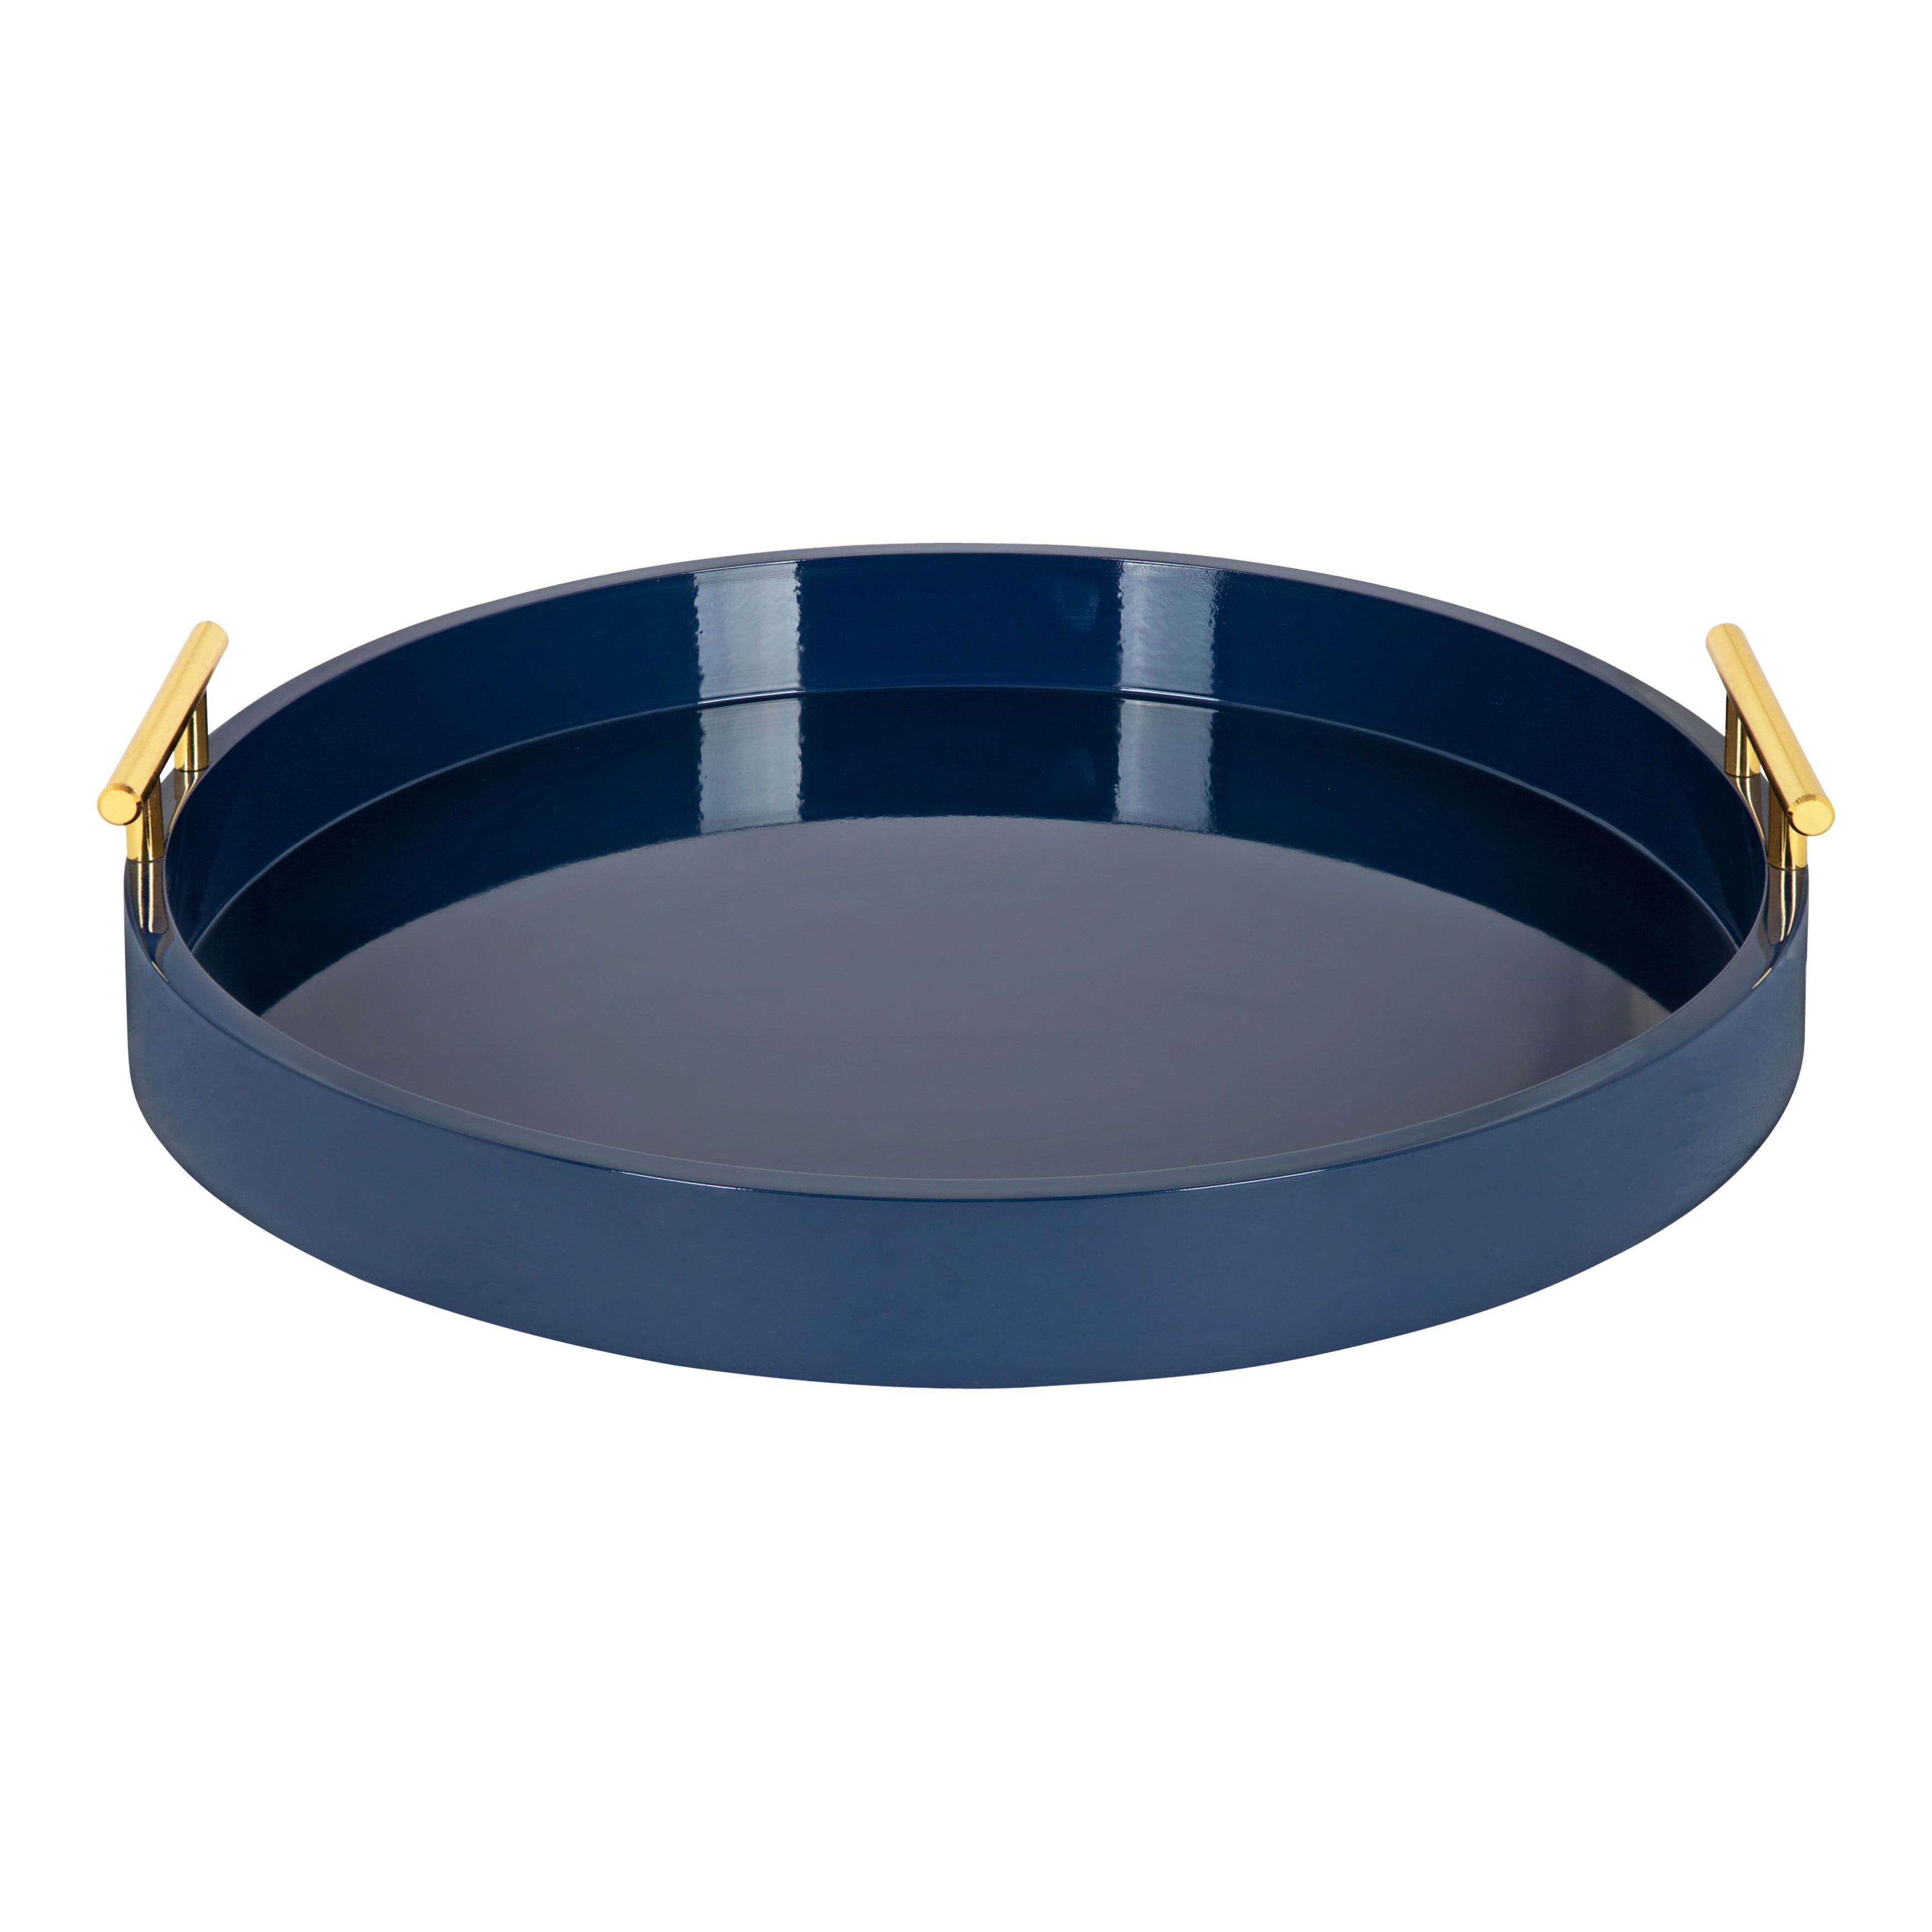 Decorative circular tray